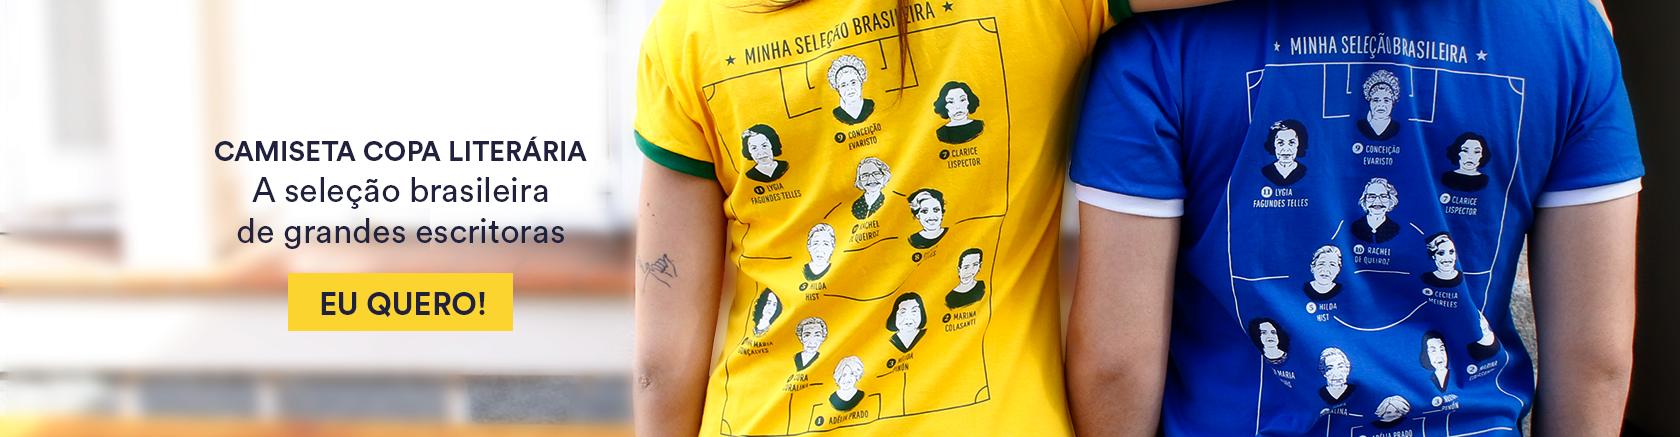 Conheça nossa exclusiva camiseta Copa Literária